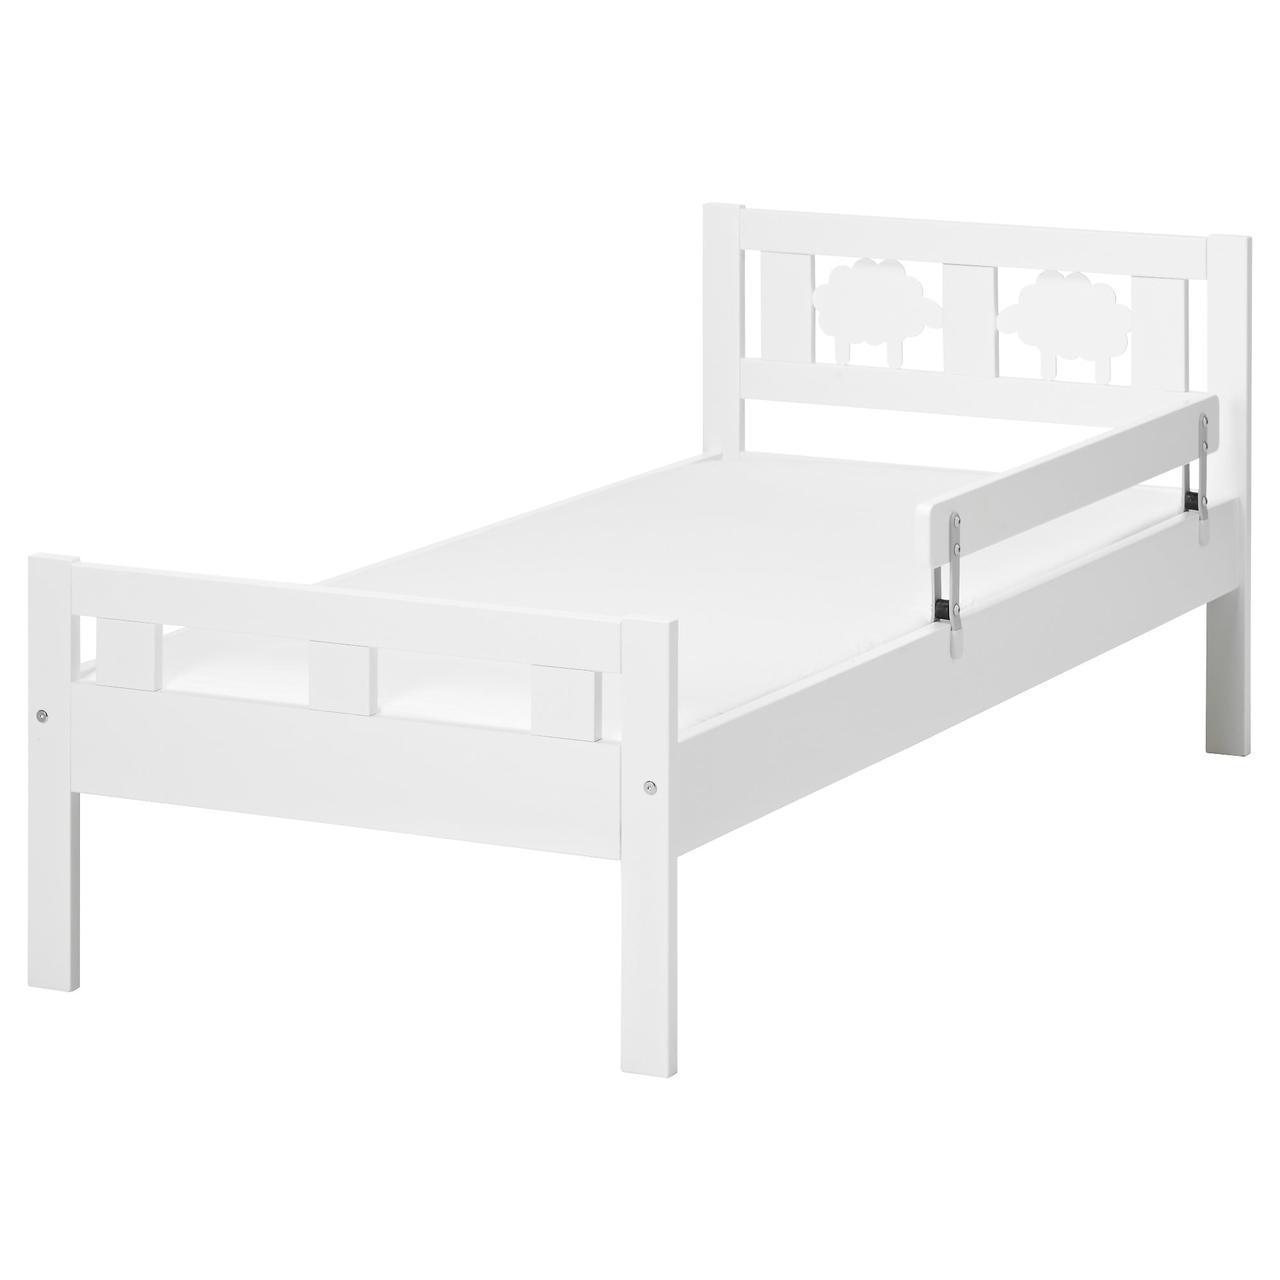 ✅ IKEA KRITTER (691.854.35) Детская кровать